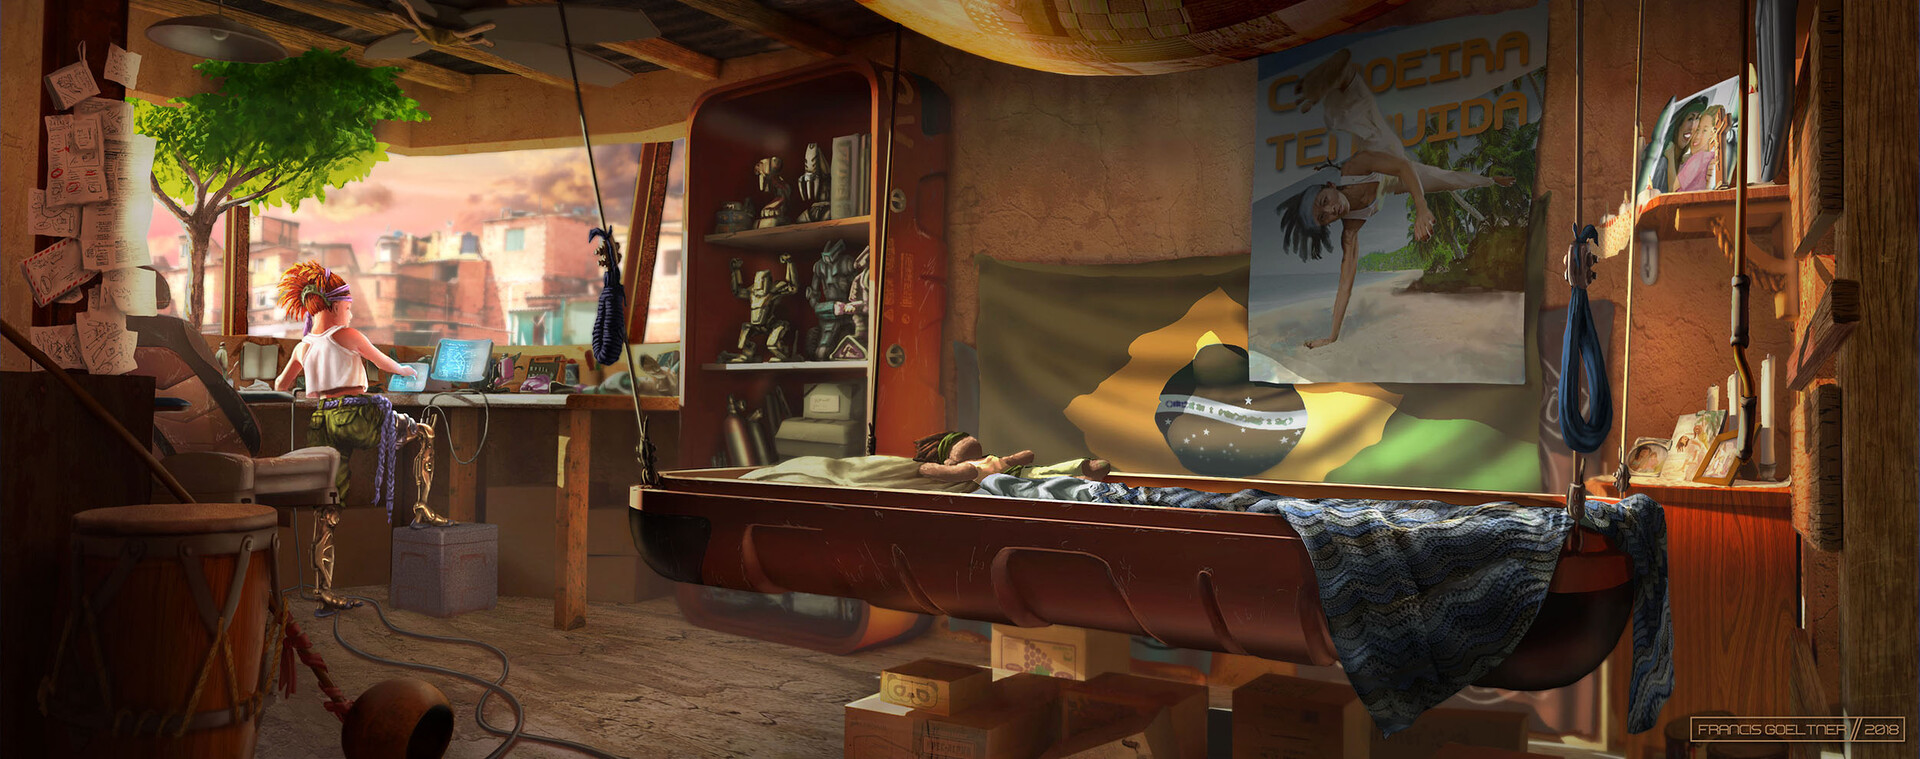 Gael's Home - Bedroom Interior Sunset